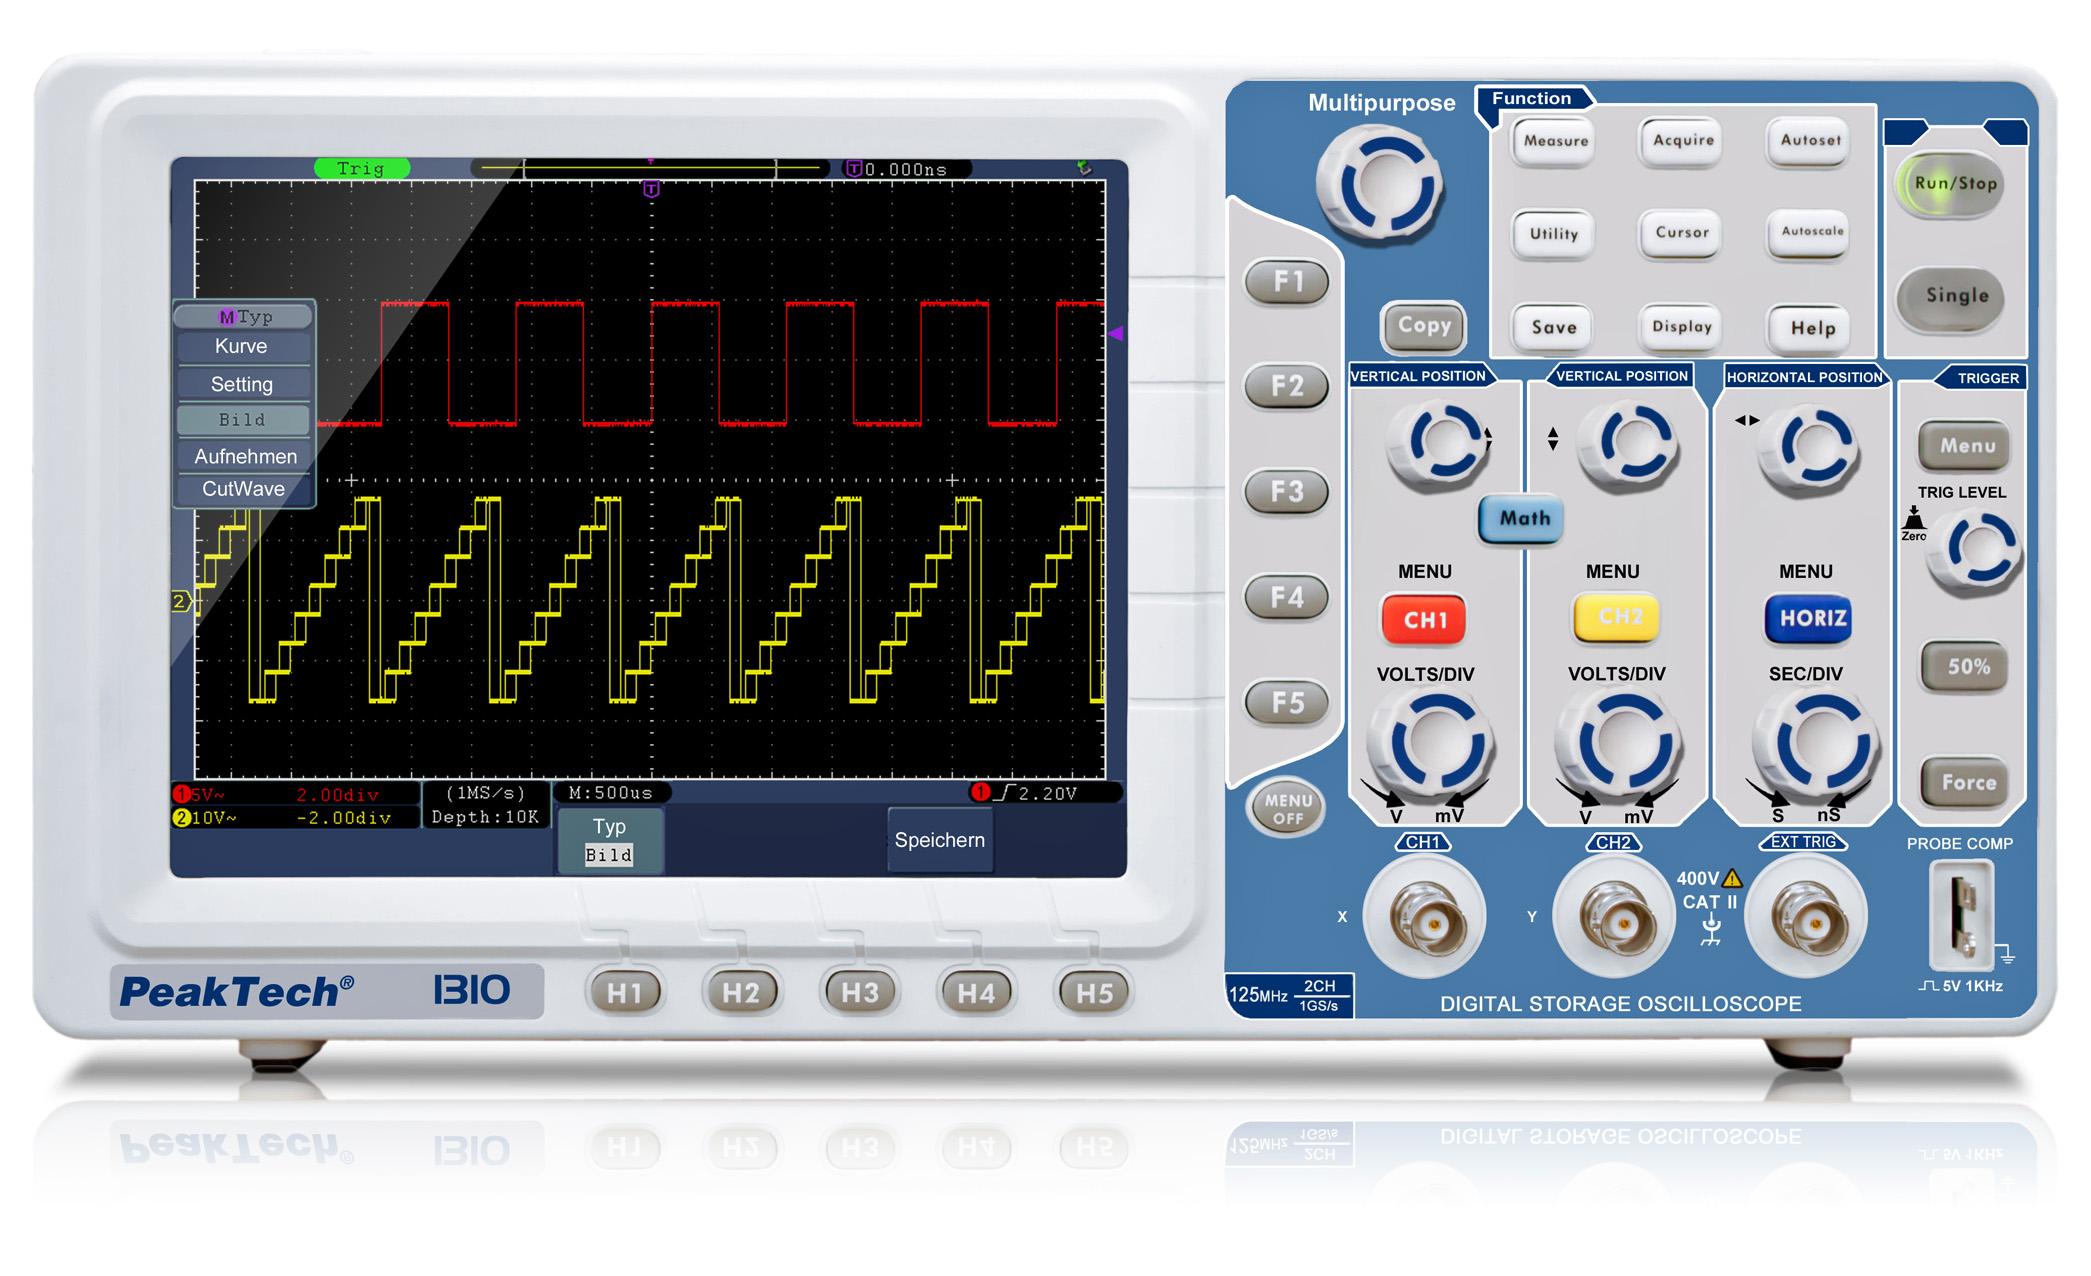 «PeakTech® P 1310» 125 MHz /2 CH, 1 GS/s digital storage oscilloscope